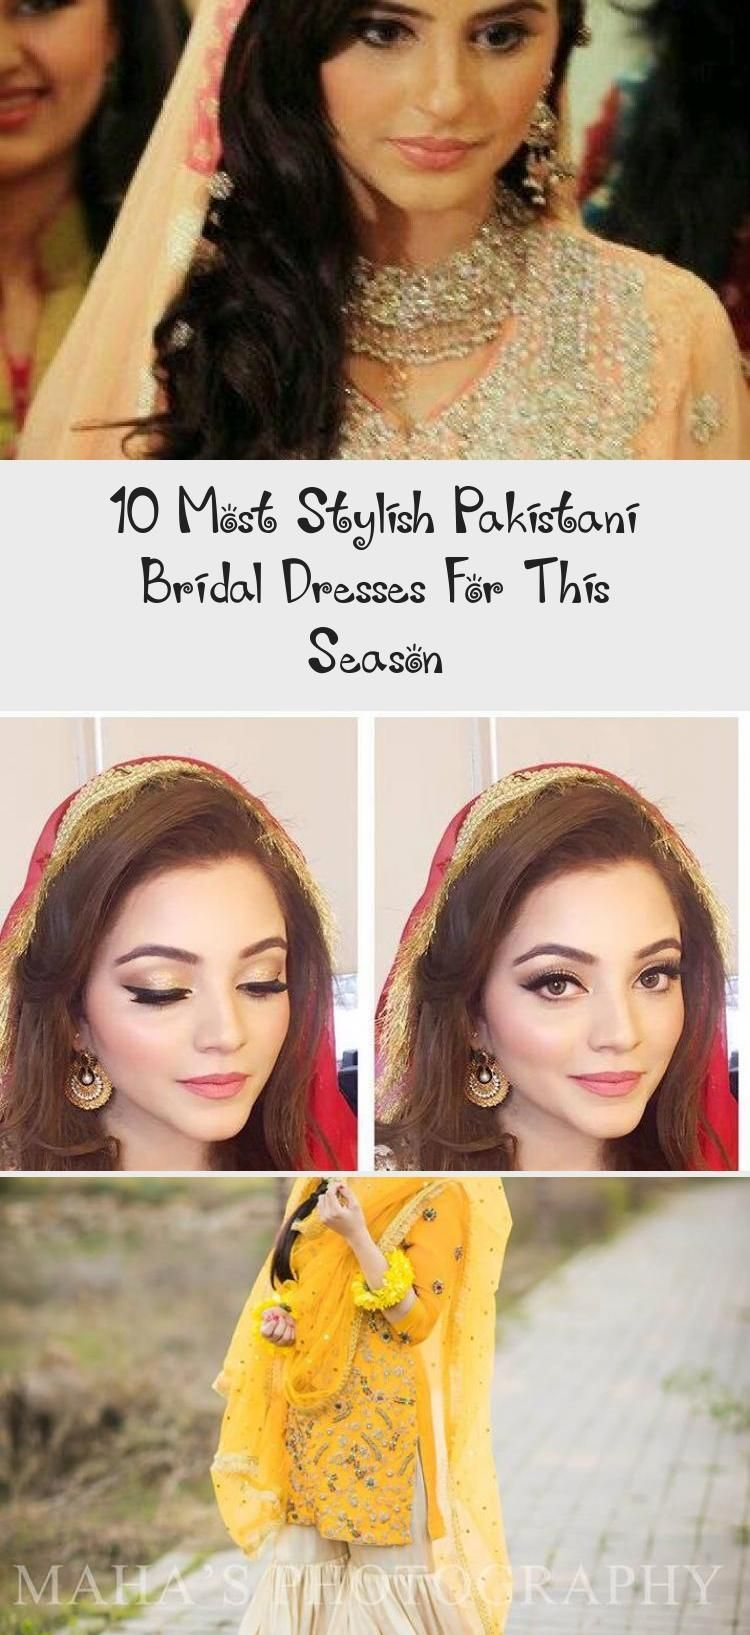 10 Most Stylish Pakistani Bridal Dresses For This Season